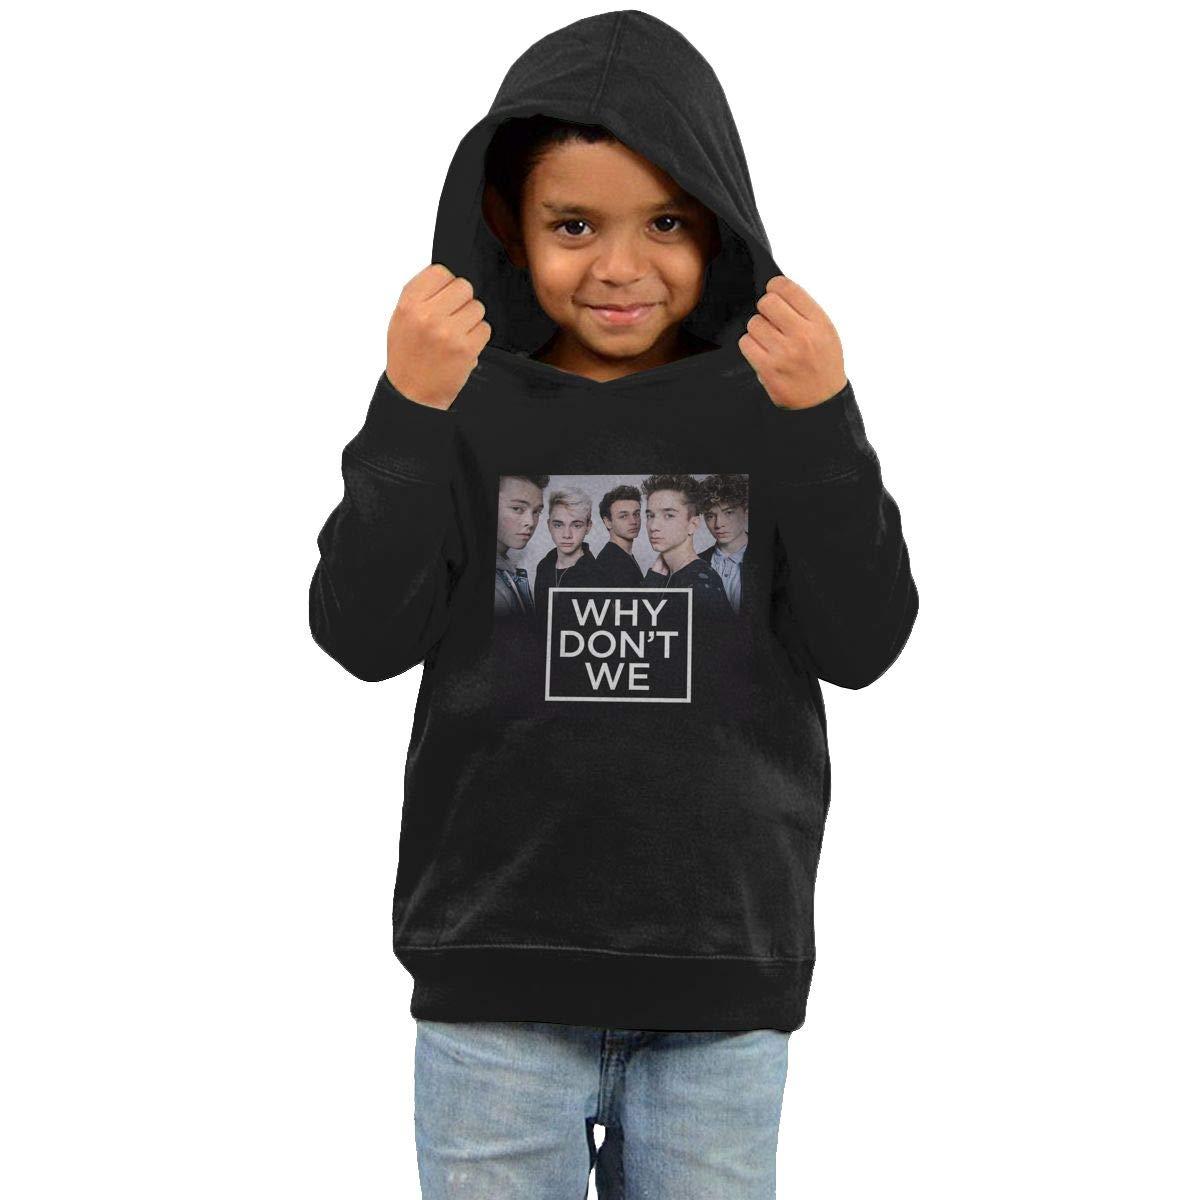 Stacy J. Payne Kids Why Don't We Cool Hoody41 Black